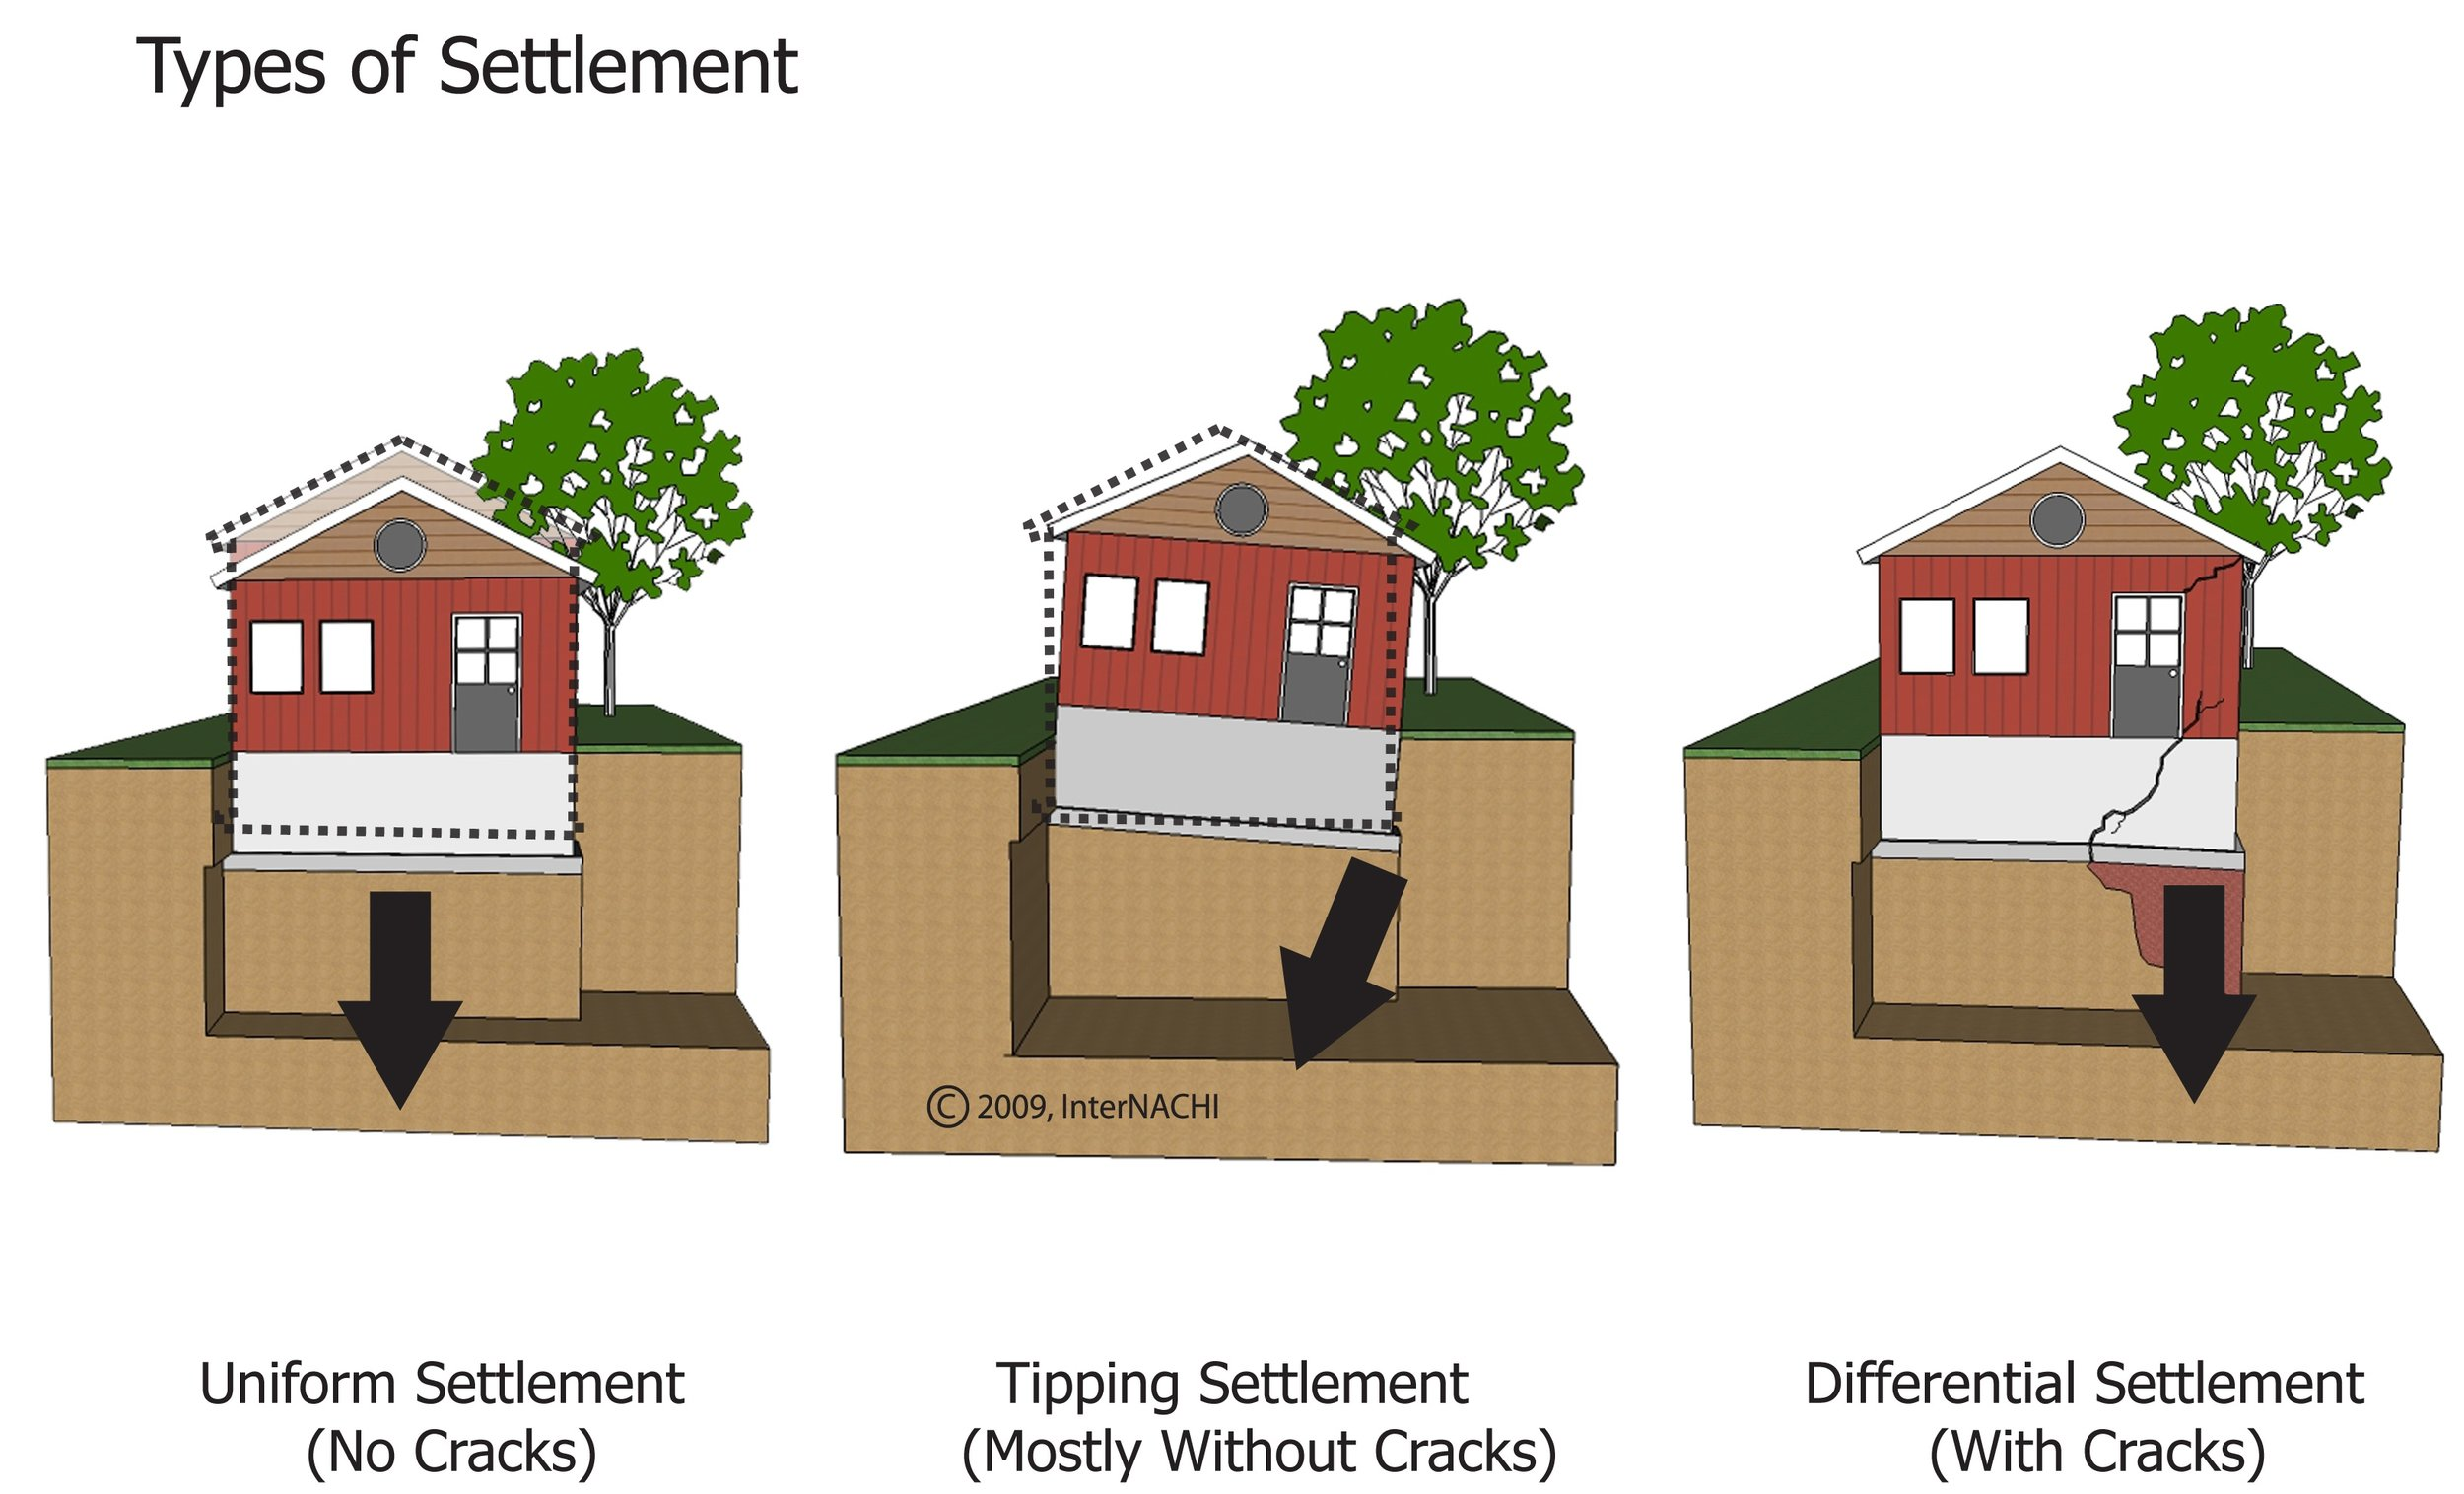 Types of home settlement